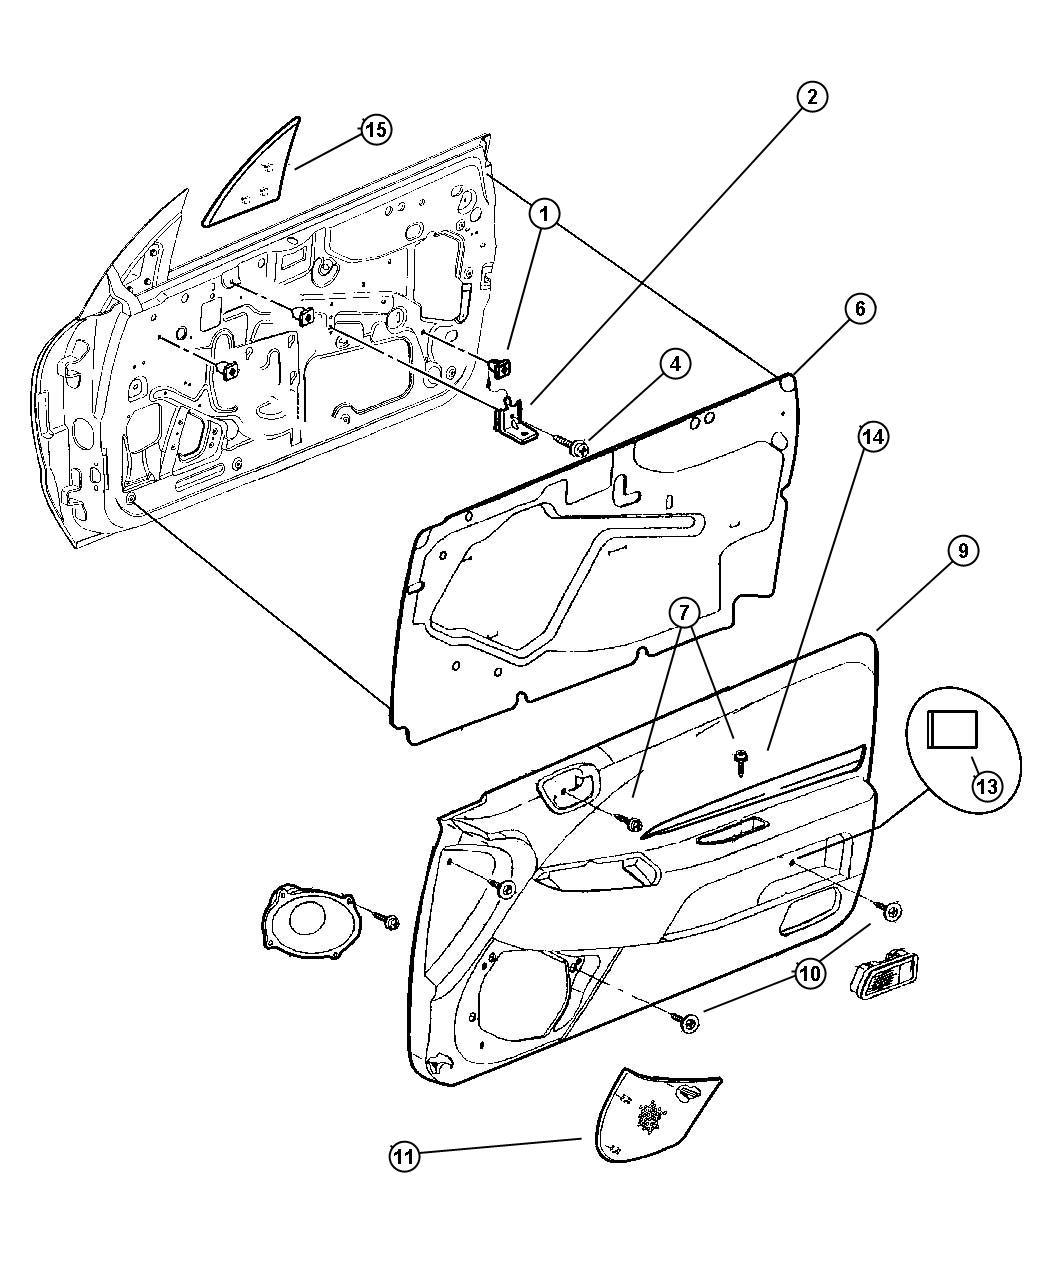 Chrysler Sebring Convertible Interior Parts